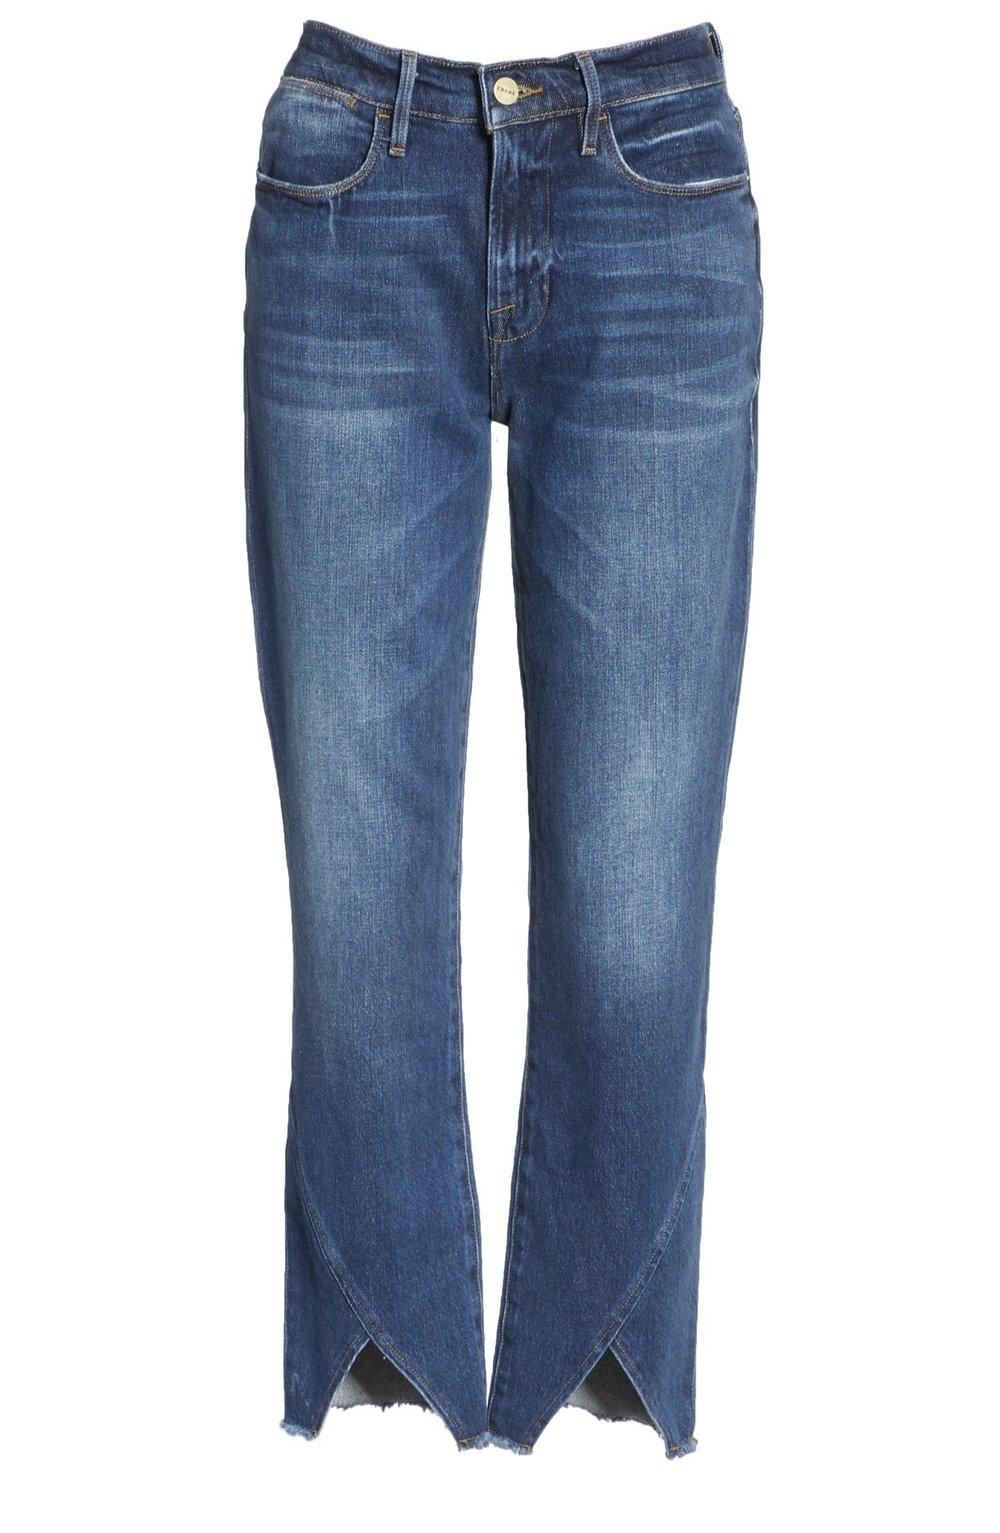 FRAME Le High Straight Asymmetrical Hem Jeans {$166.90} - After sale: $250